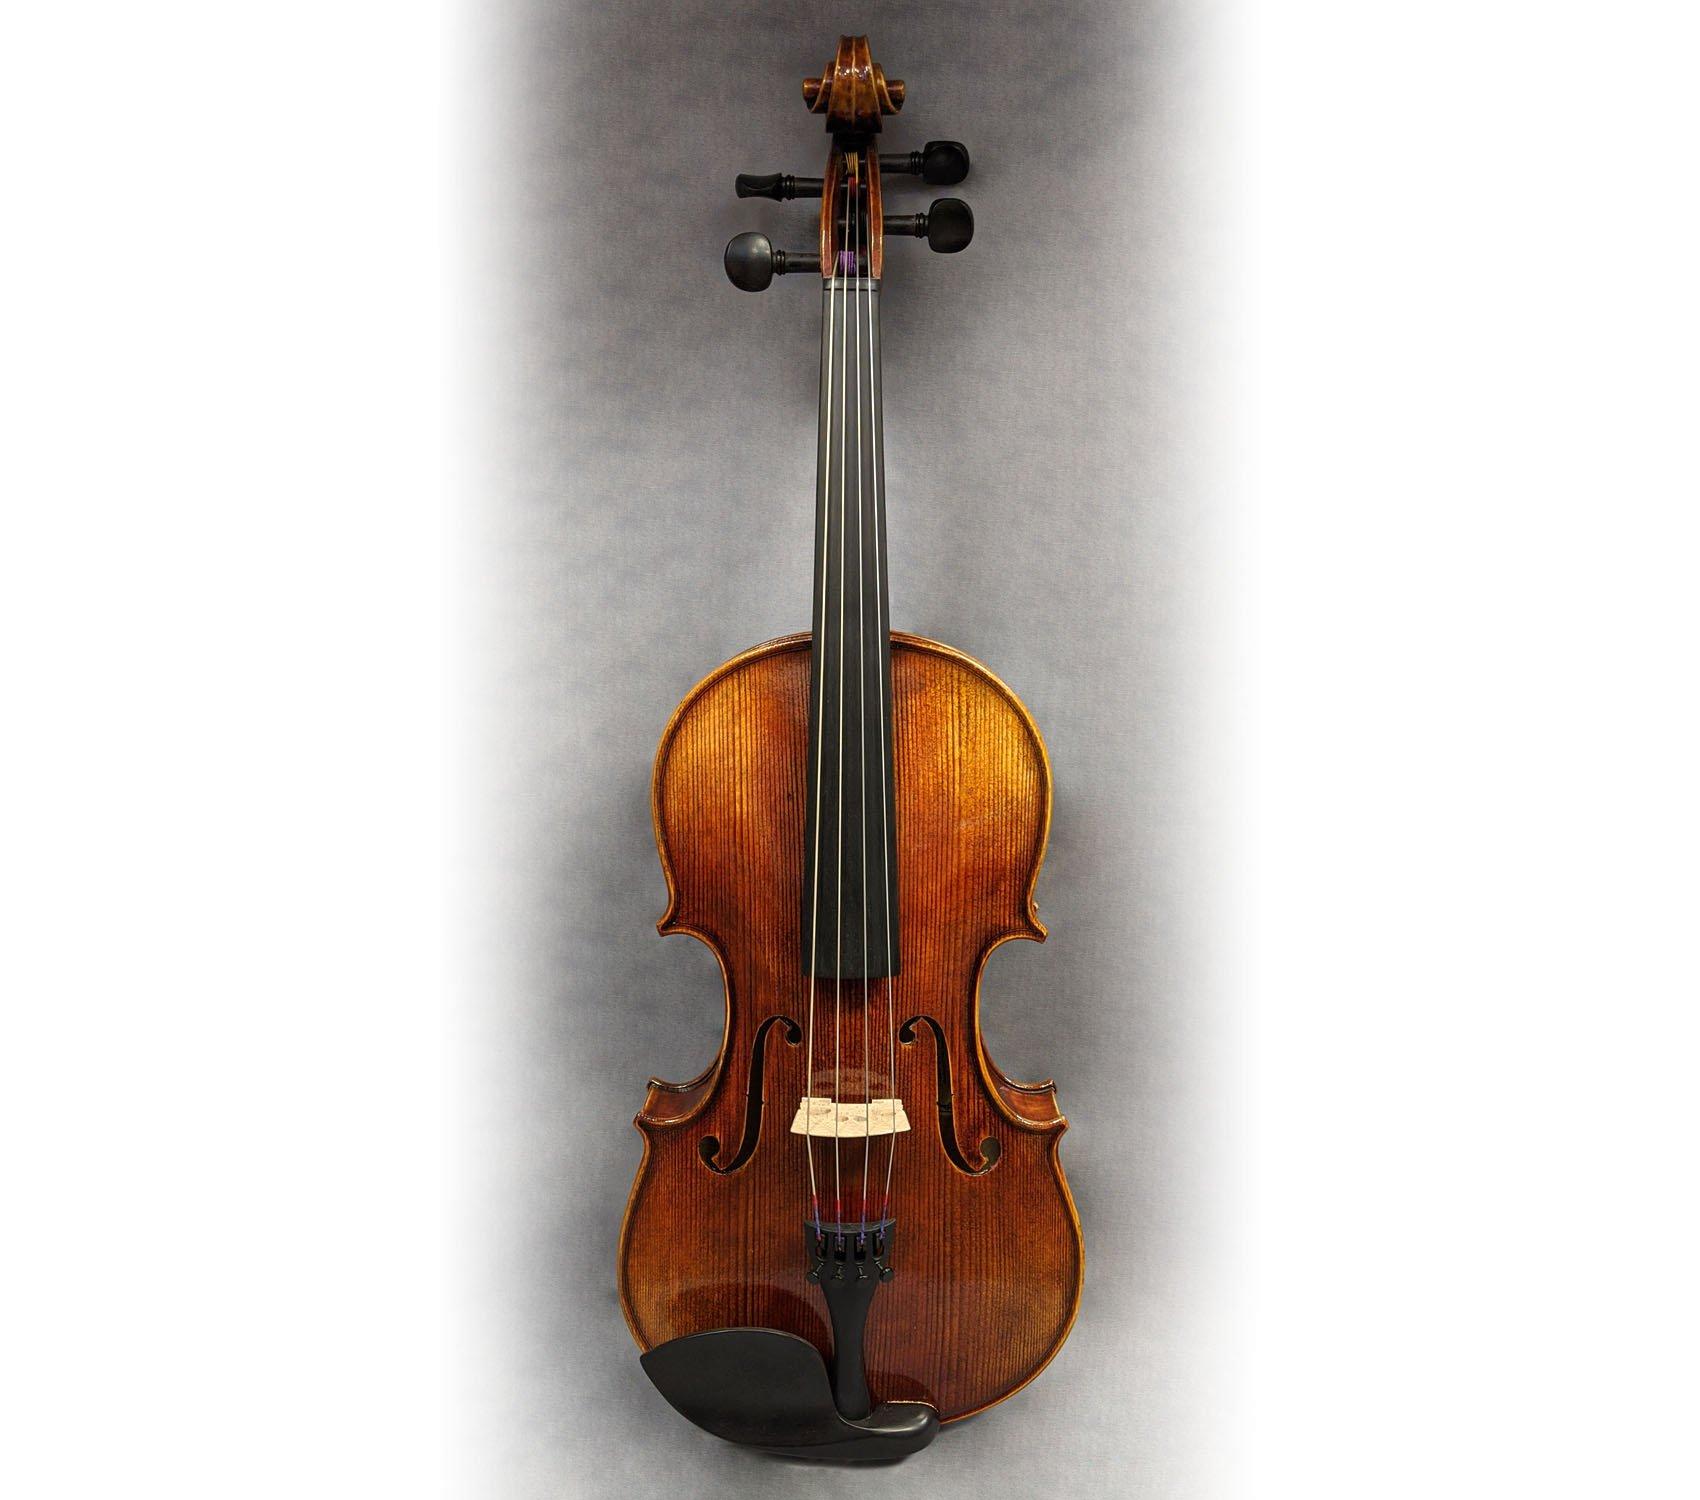 Pavia VA461 Viola, 15.5